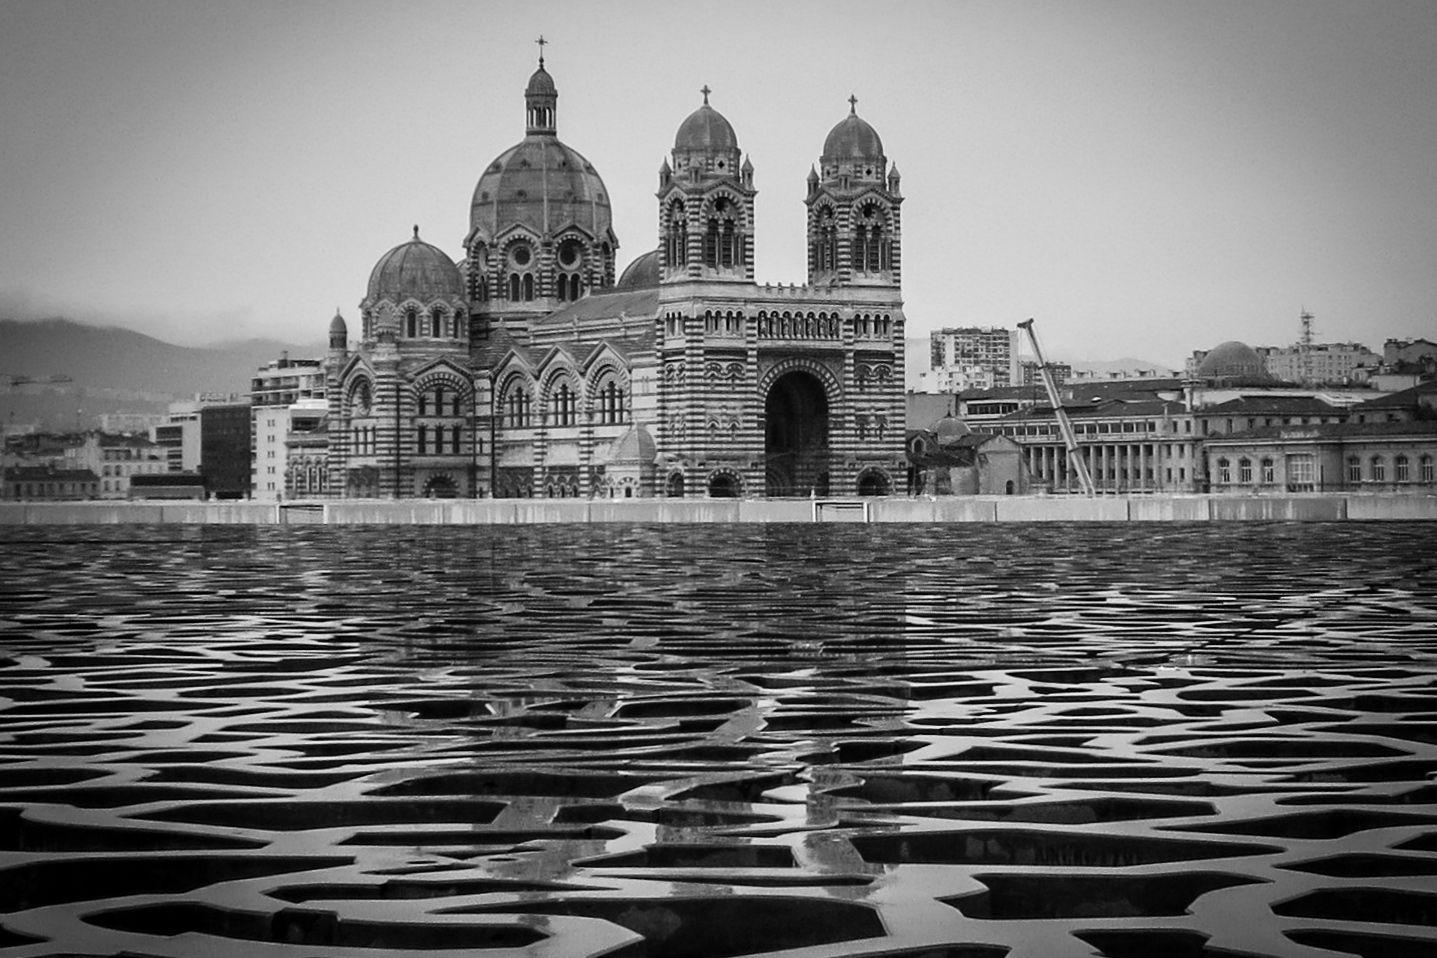 Marseilles, France